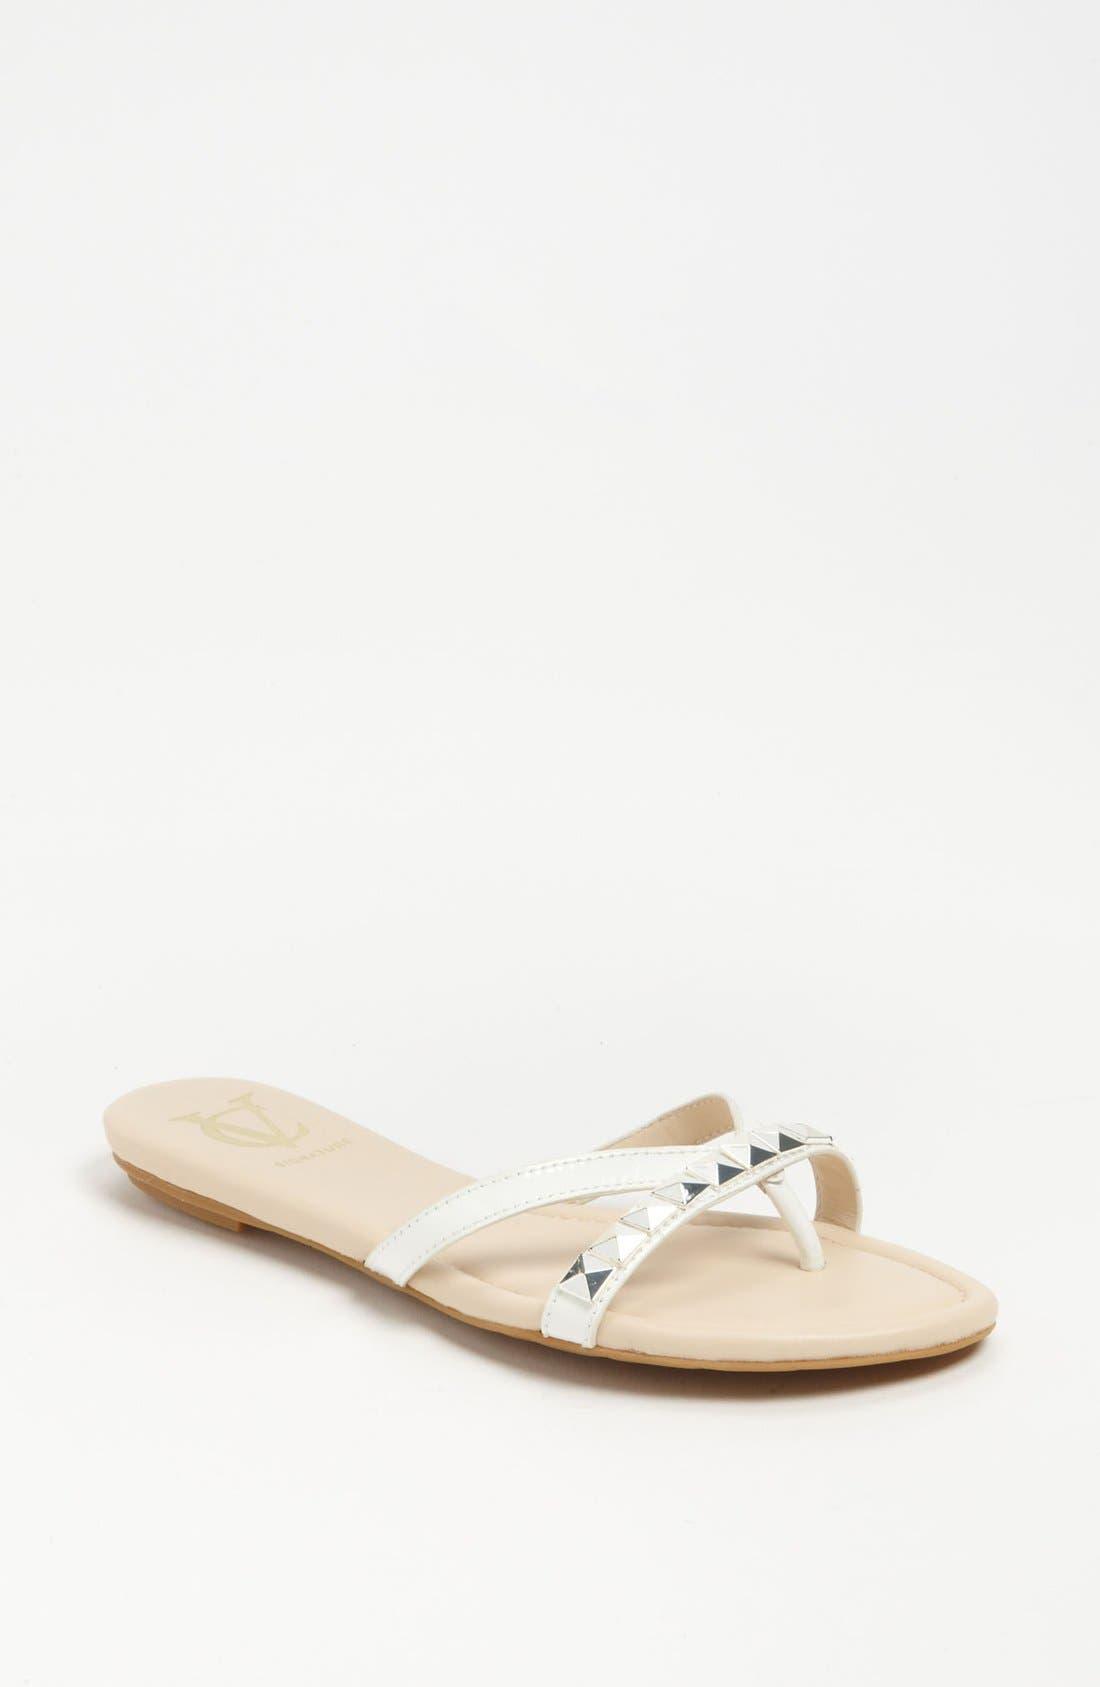 Alternate Image 1 Selected - VC Signature 'Figaro' Sandal